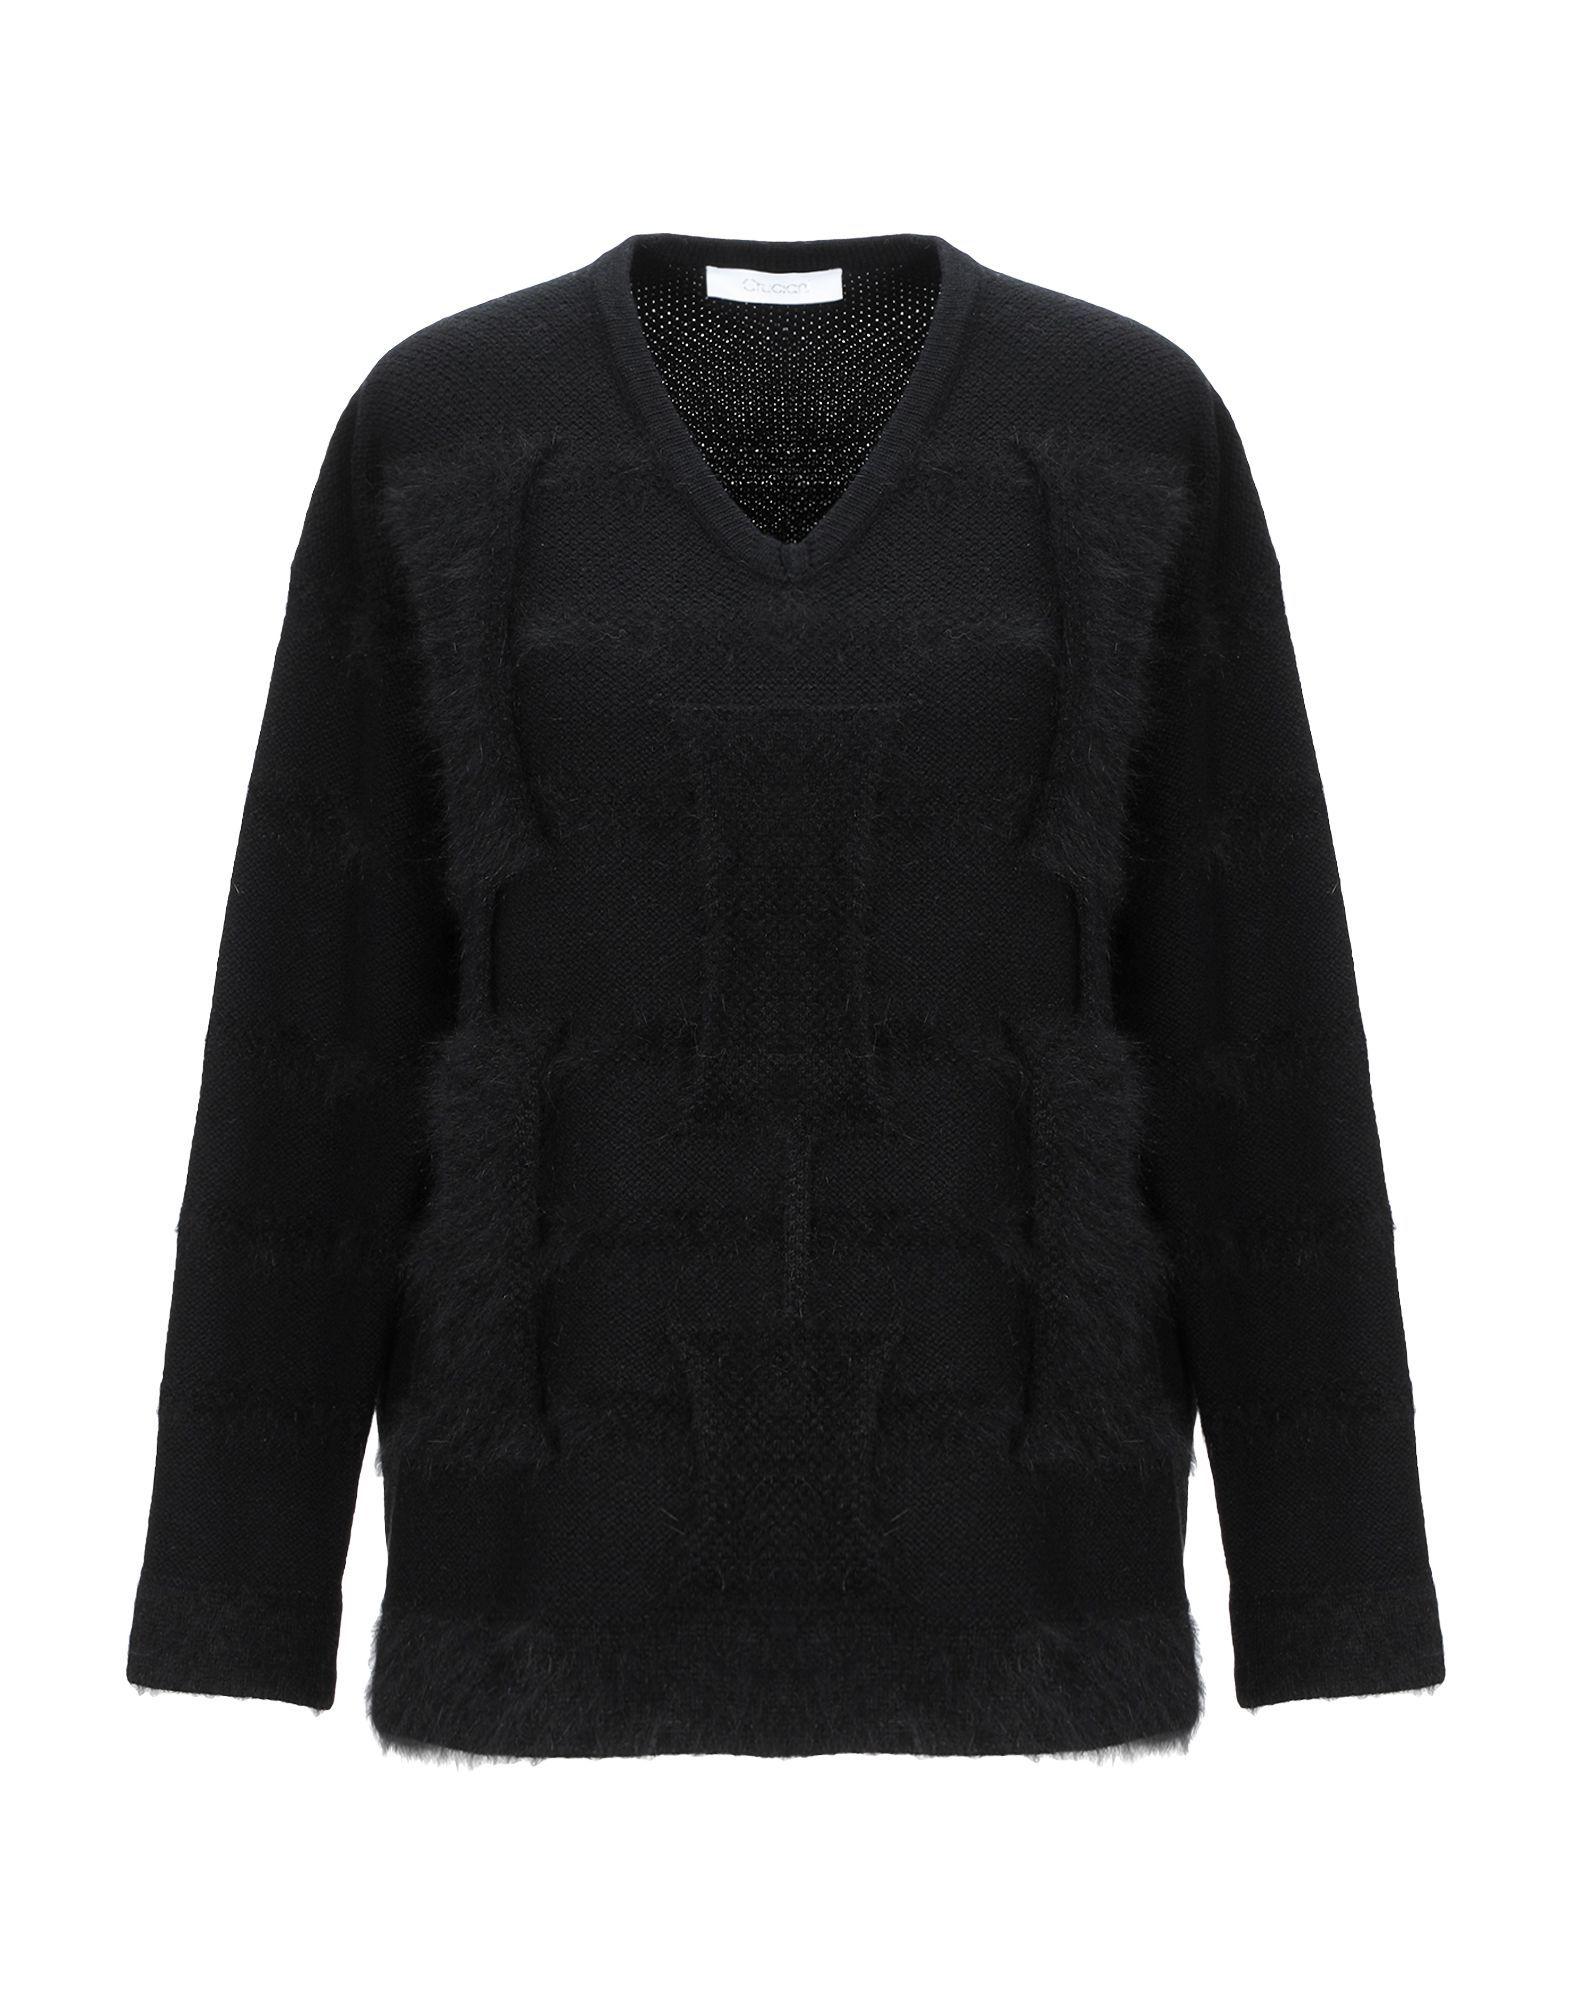 KNITWEAR Cruciani Black Woman Wool